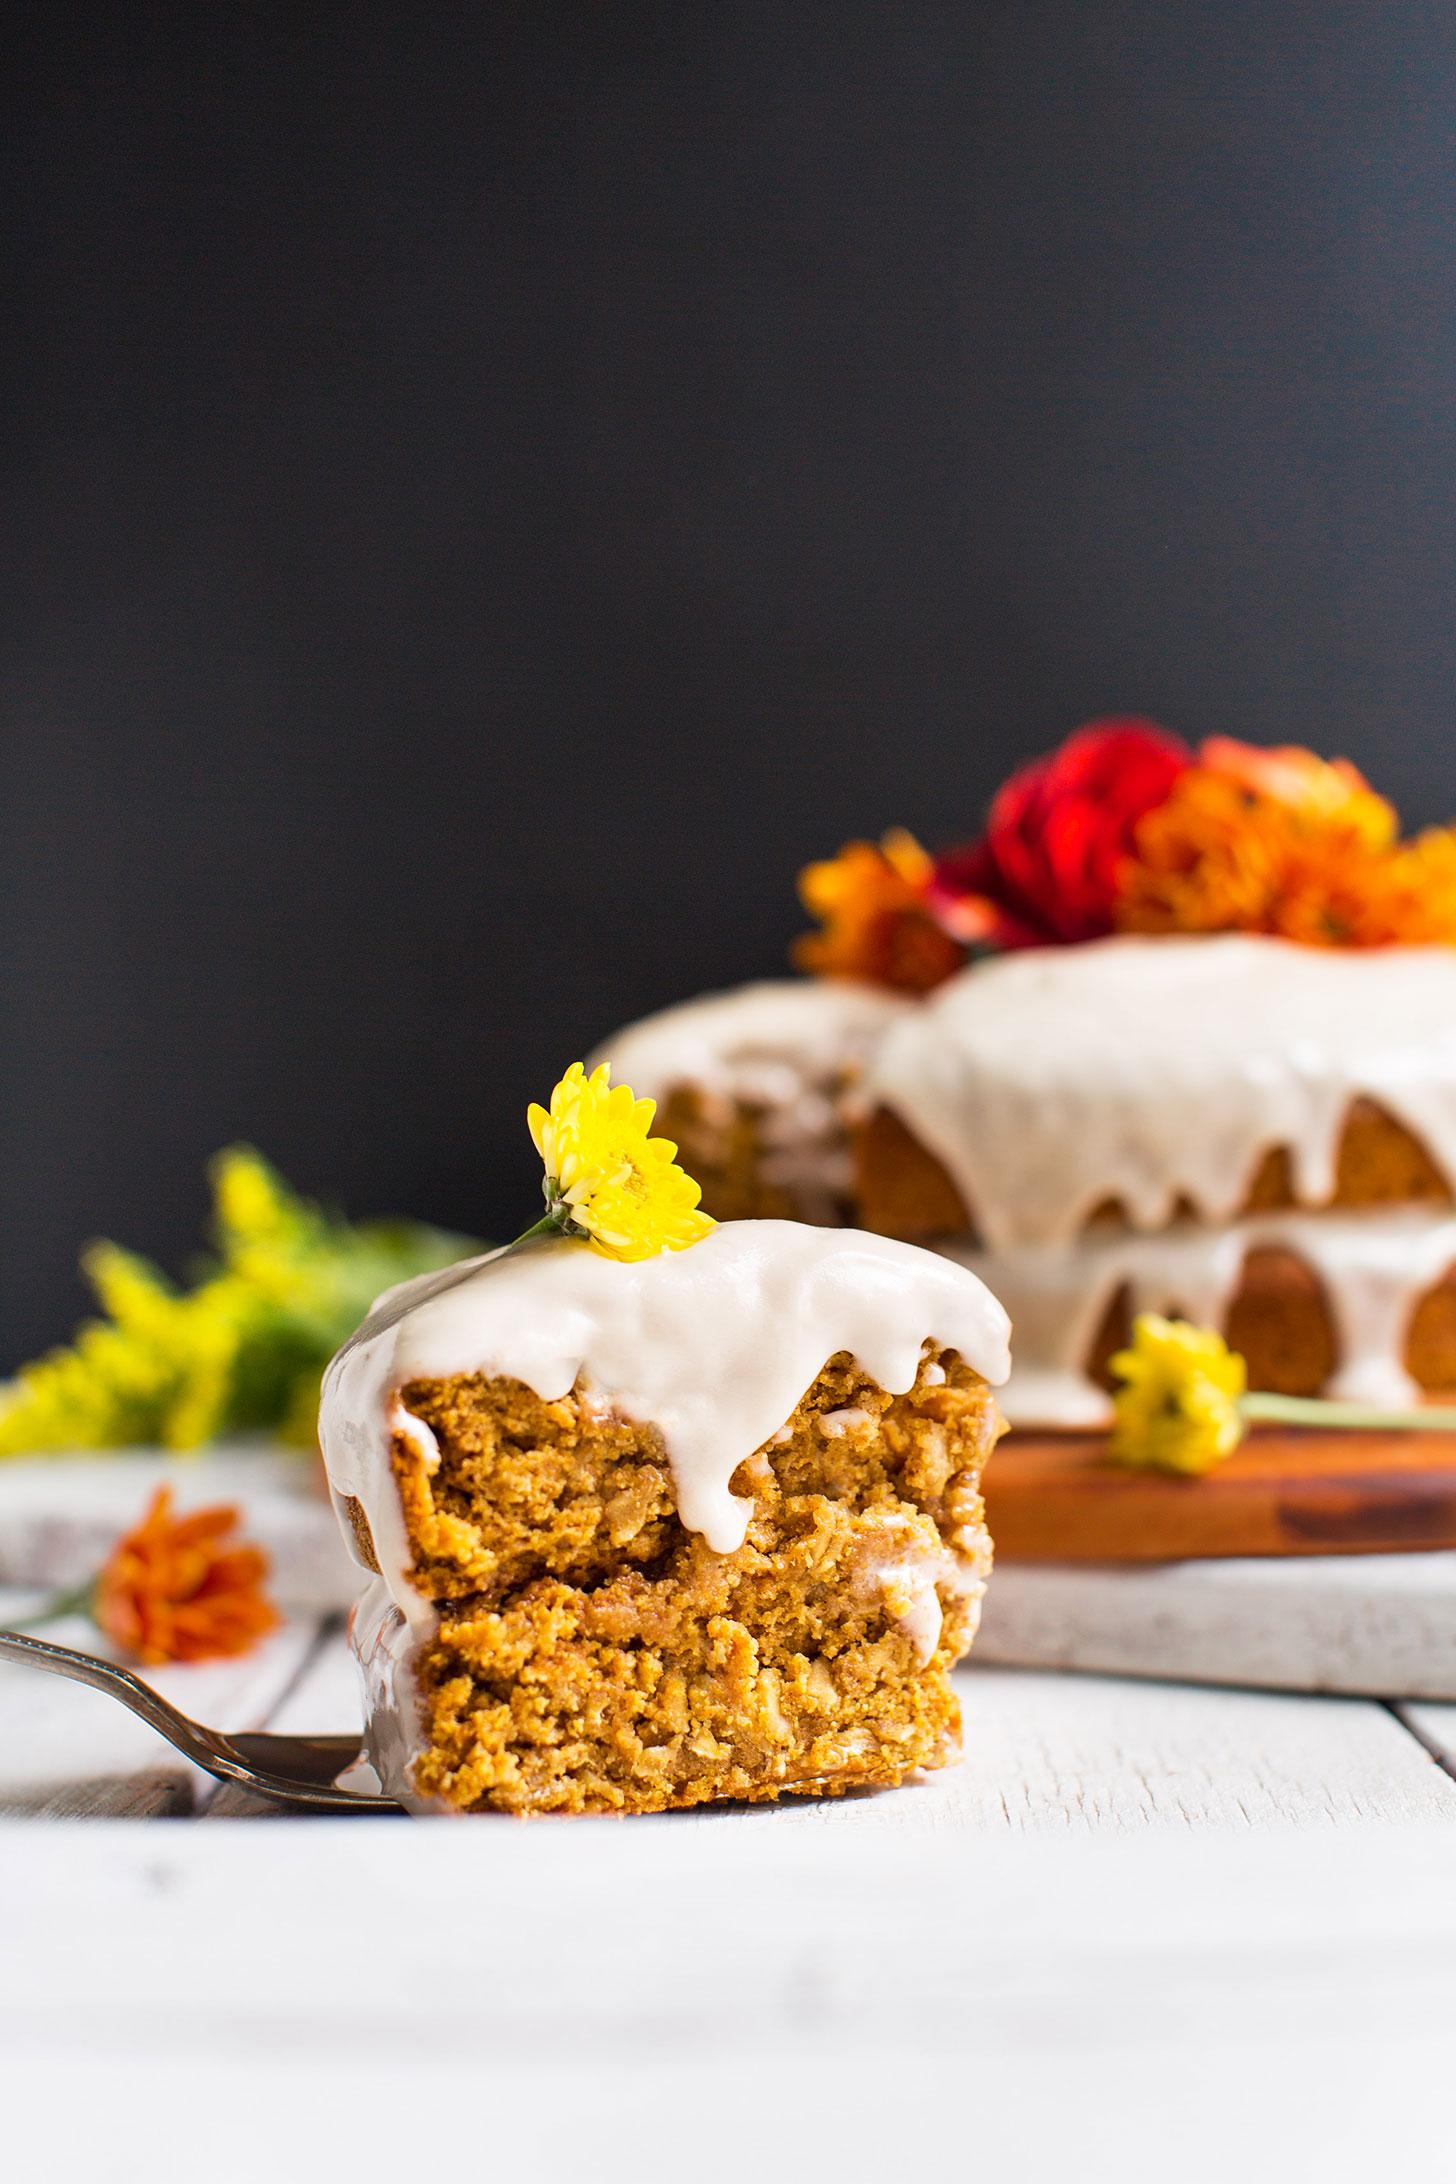 15 Best Healthy Dessert Recipes